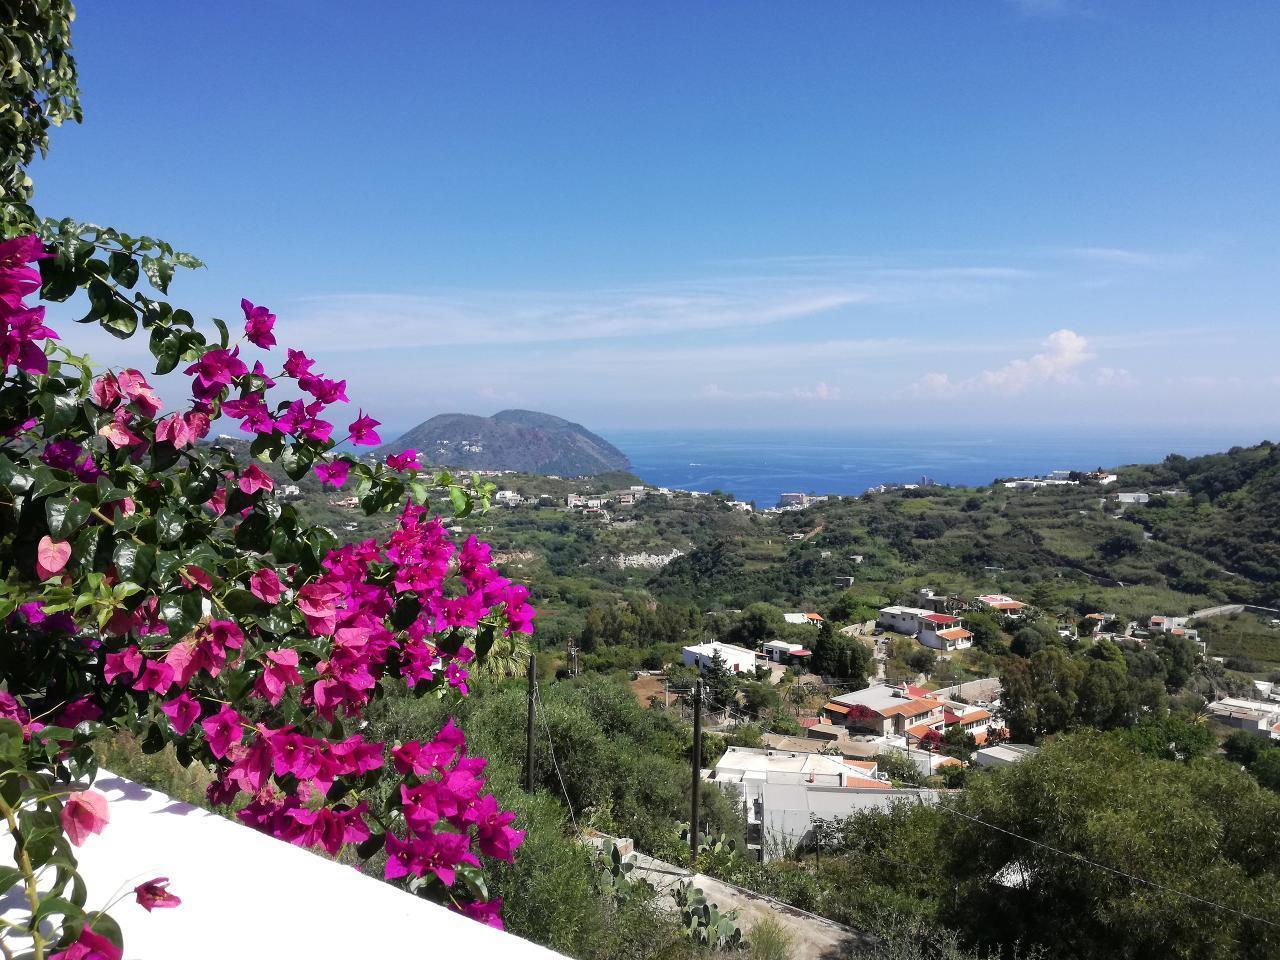 Maison de vacances Ferienhaushälfte Solandra auf sizilianischer Insel mit atemberaubenden Meeres-Rundblick (2038046), Lipari, Lipari, Sicile, Italie, image 53